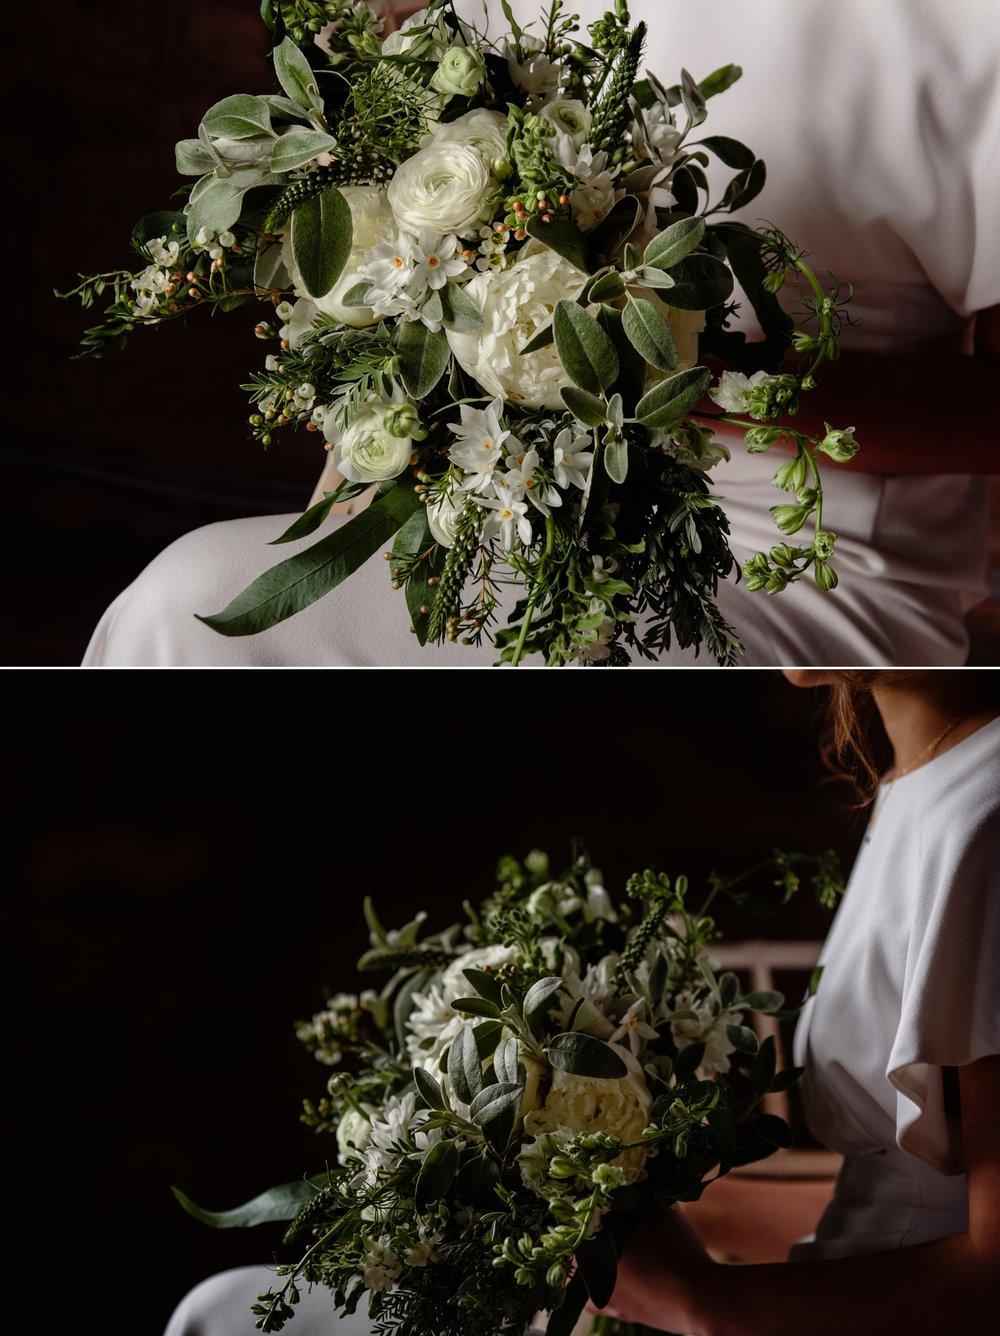 engine-works-wedding-styled-shoot-fotomaki-photography-35.jpg